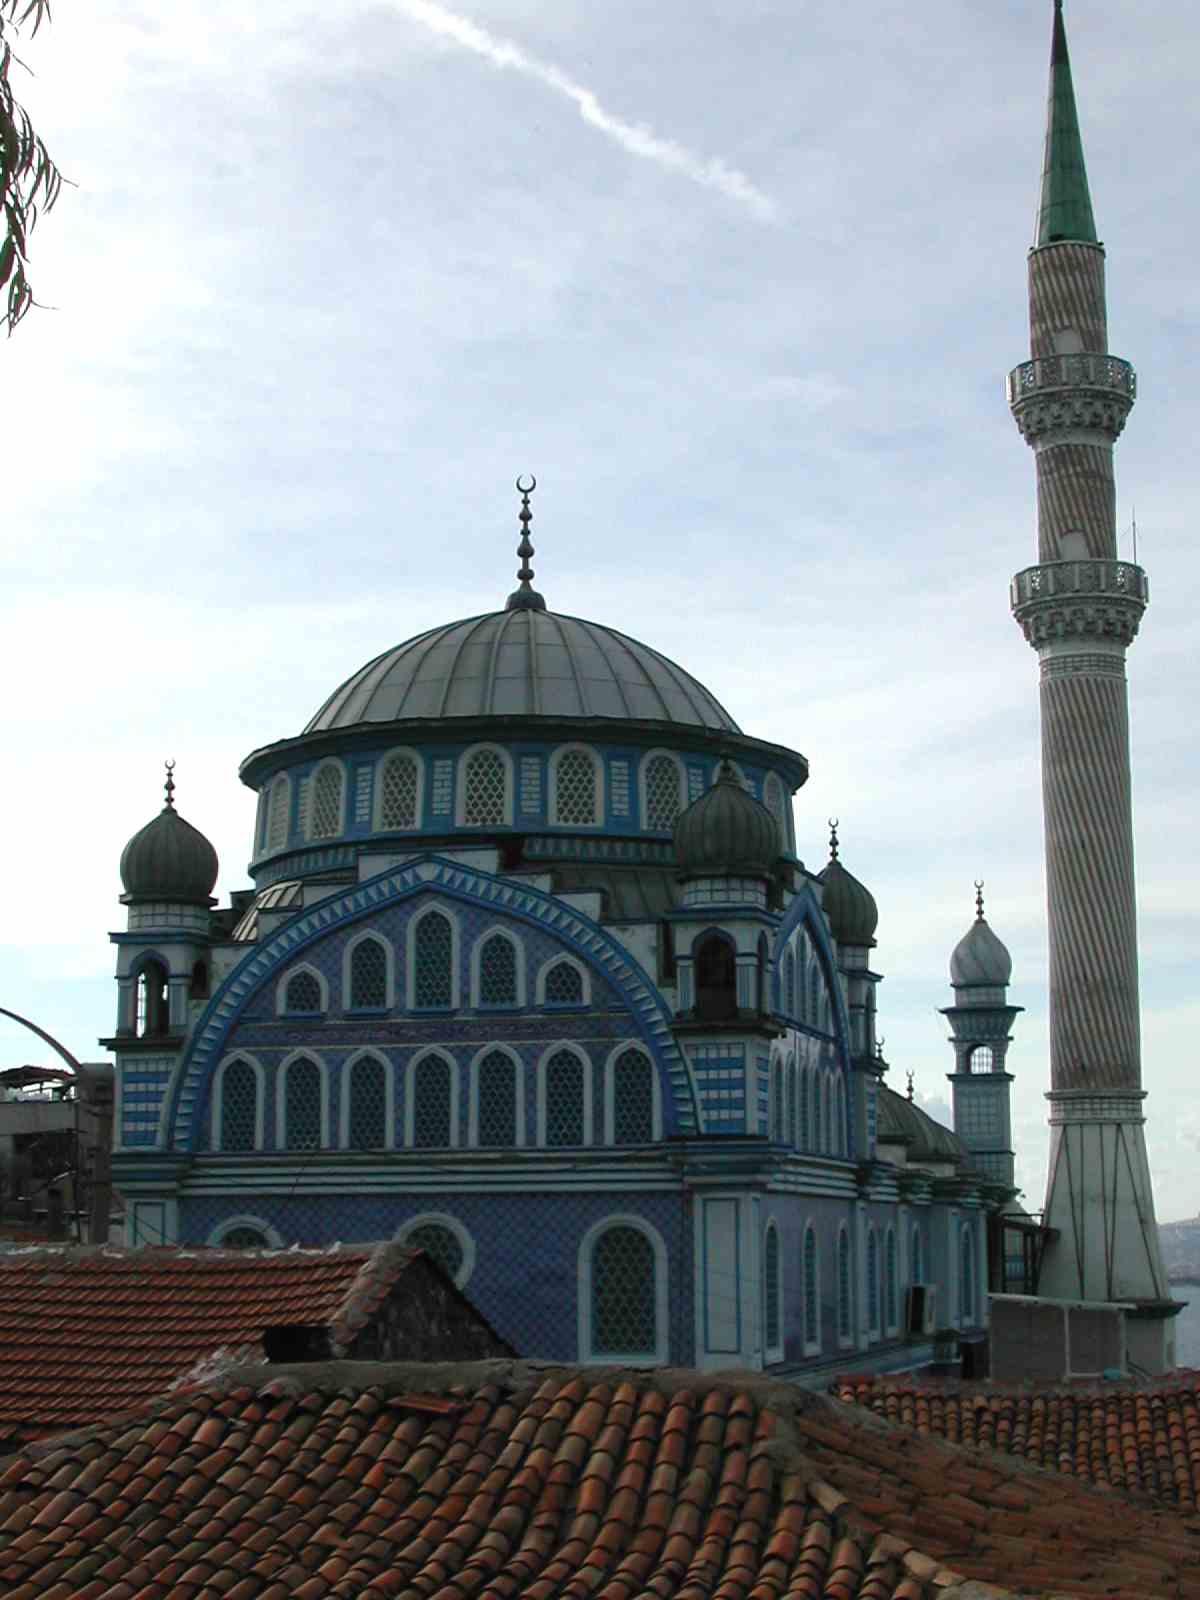 The Salepcioglu Mosque, Izmir, May 2003